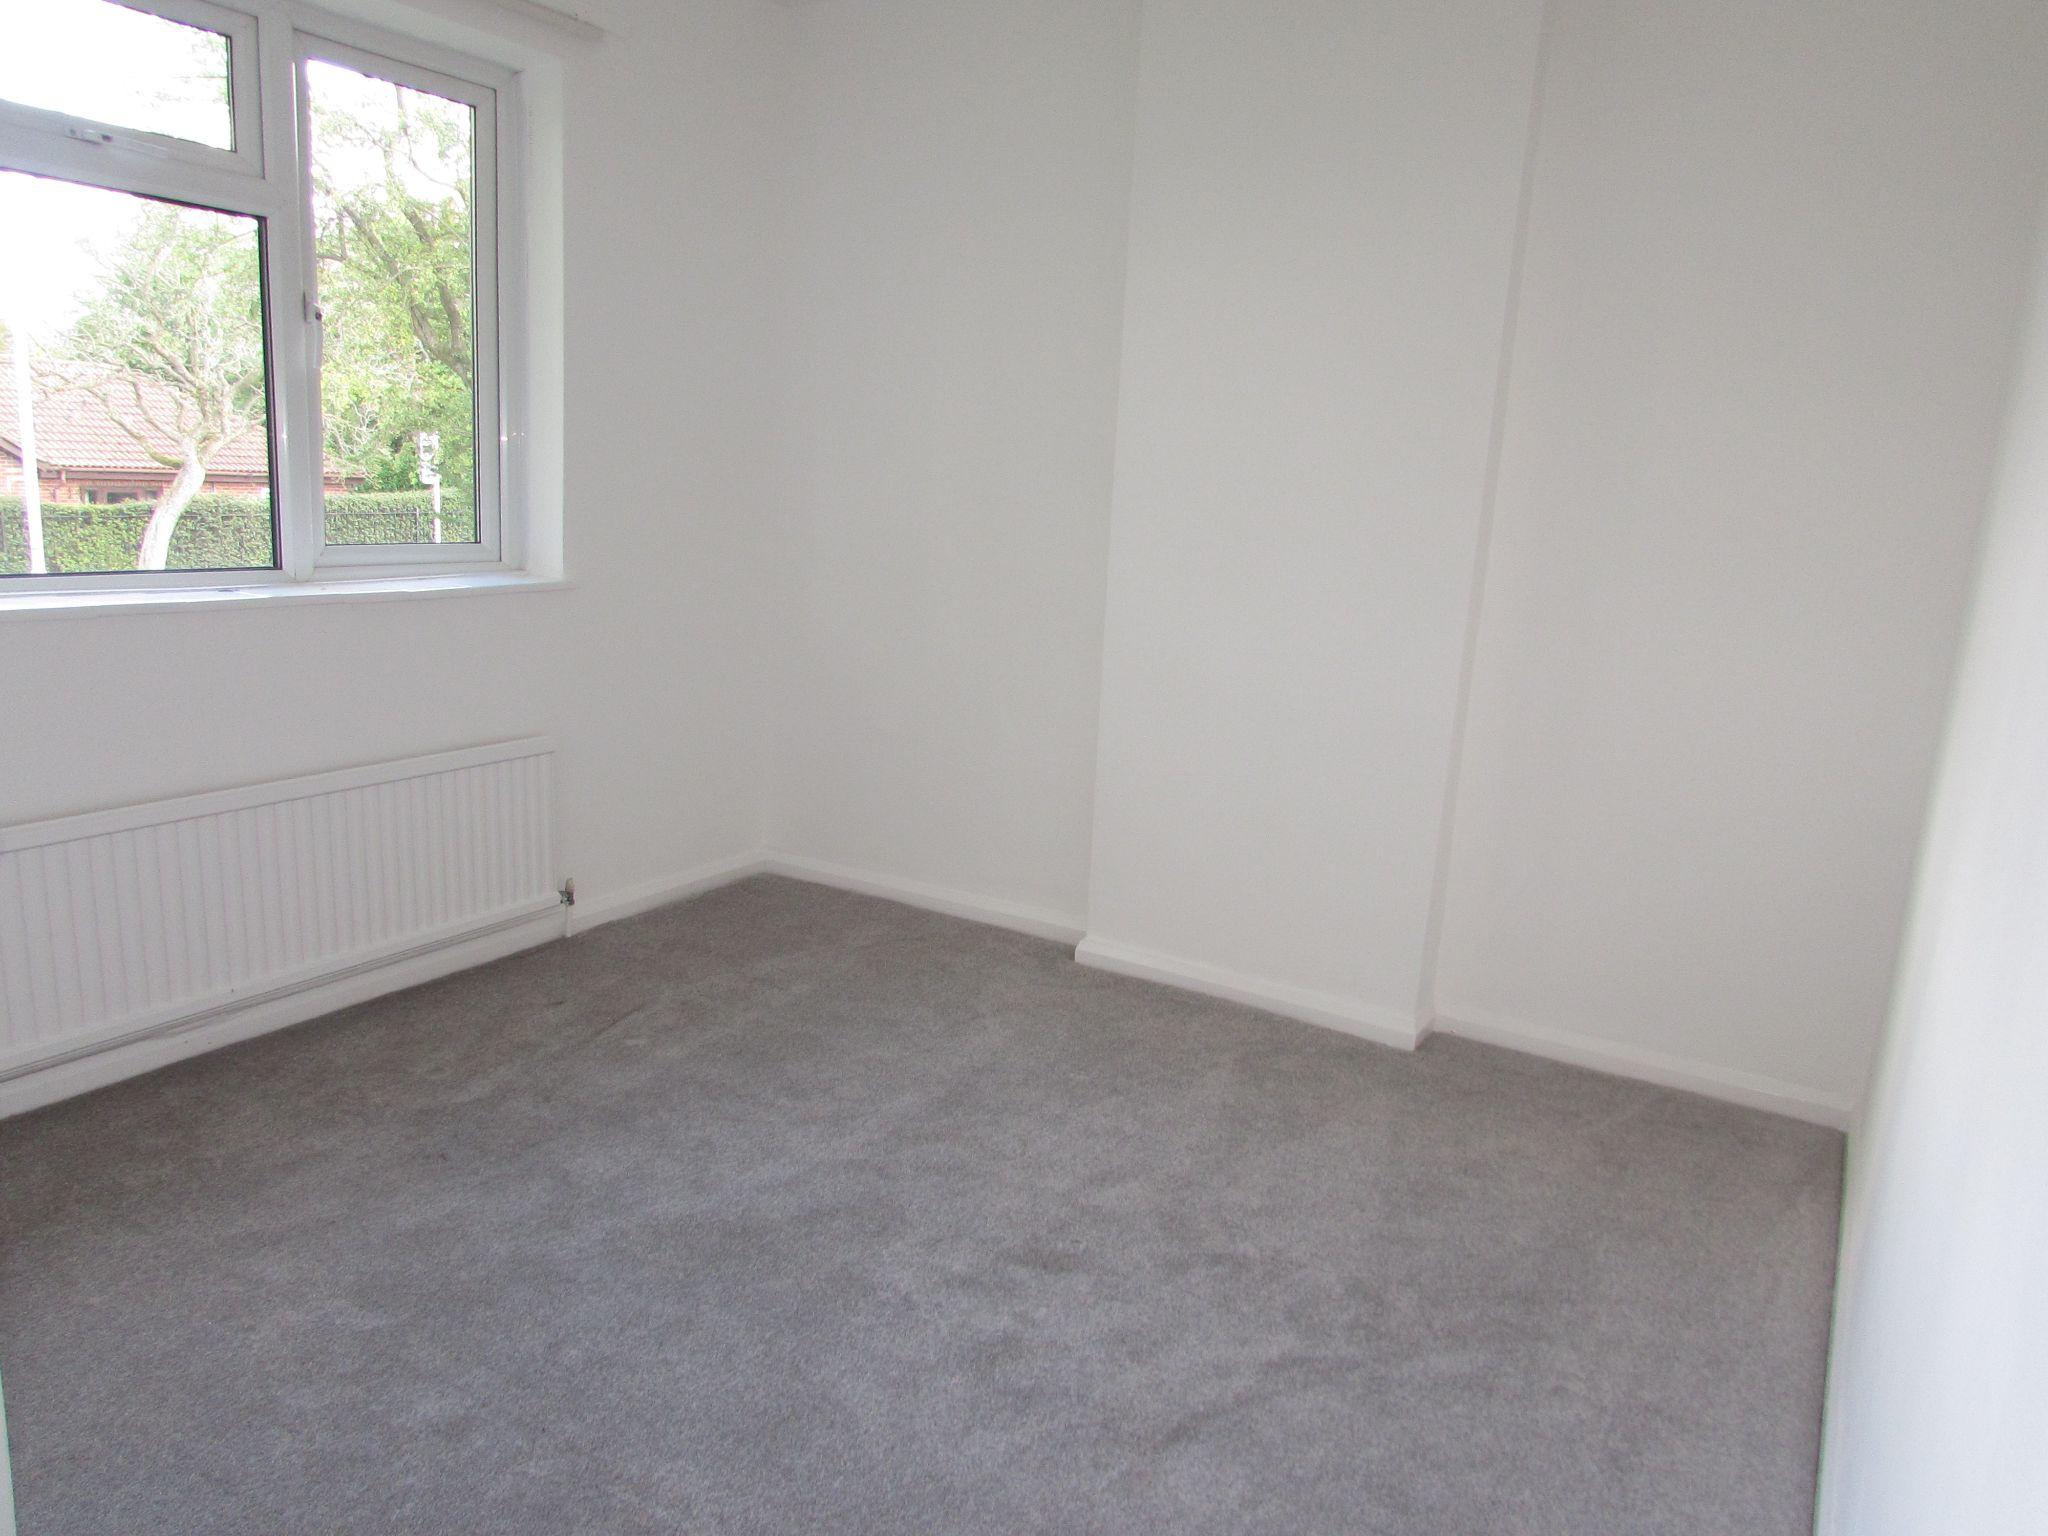 4 Bedroom Semi-detached House For Sale - BEDROOM 2